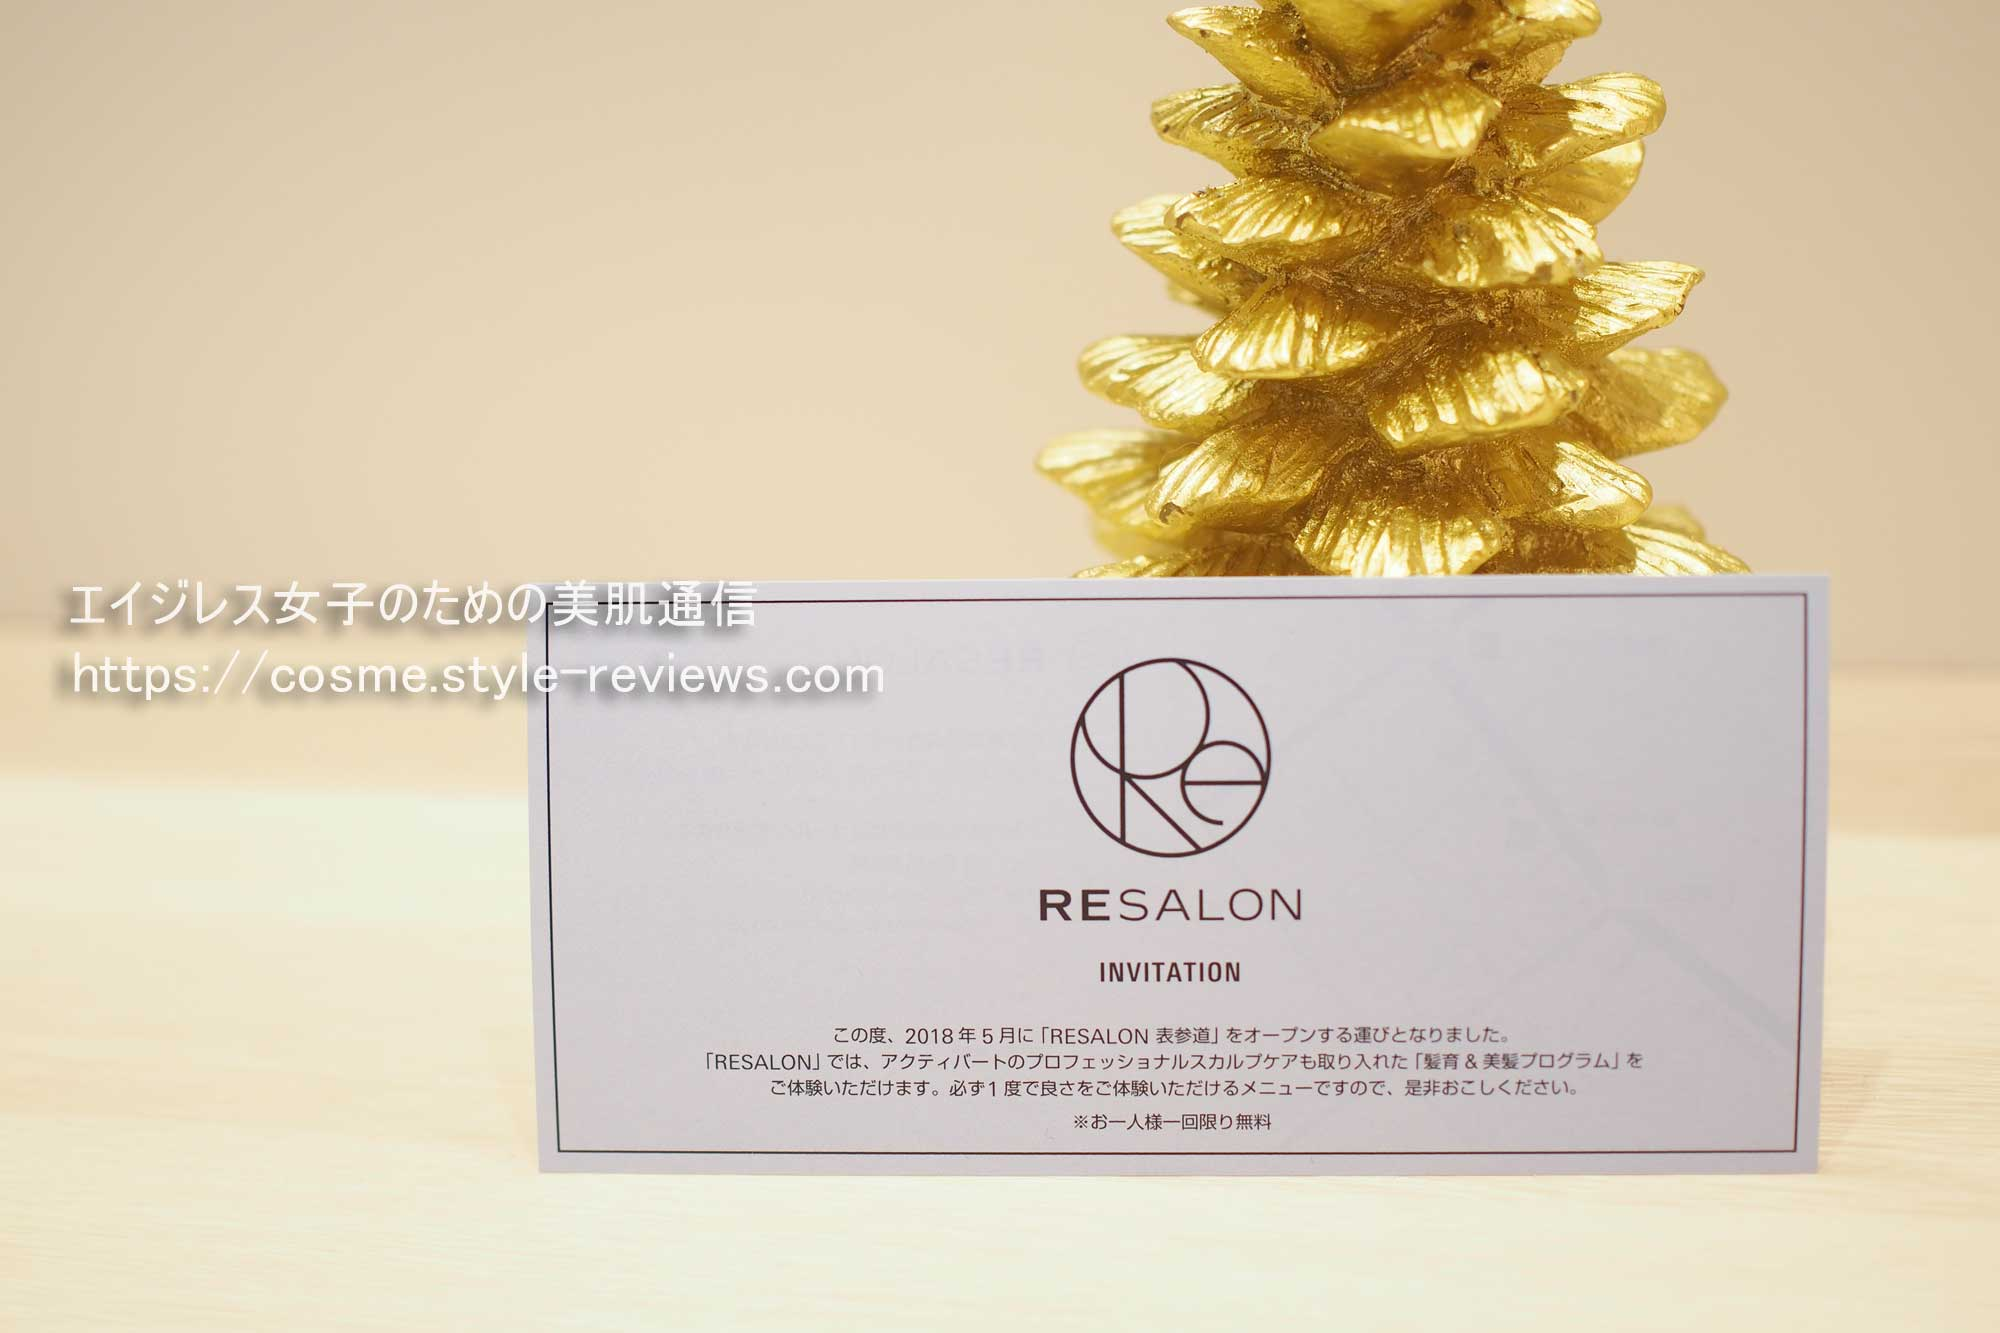 RESALONの美髪トリートメントチケット